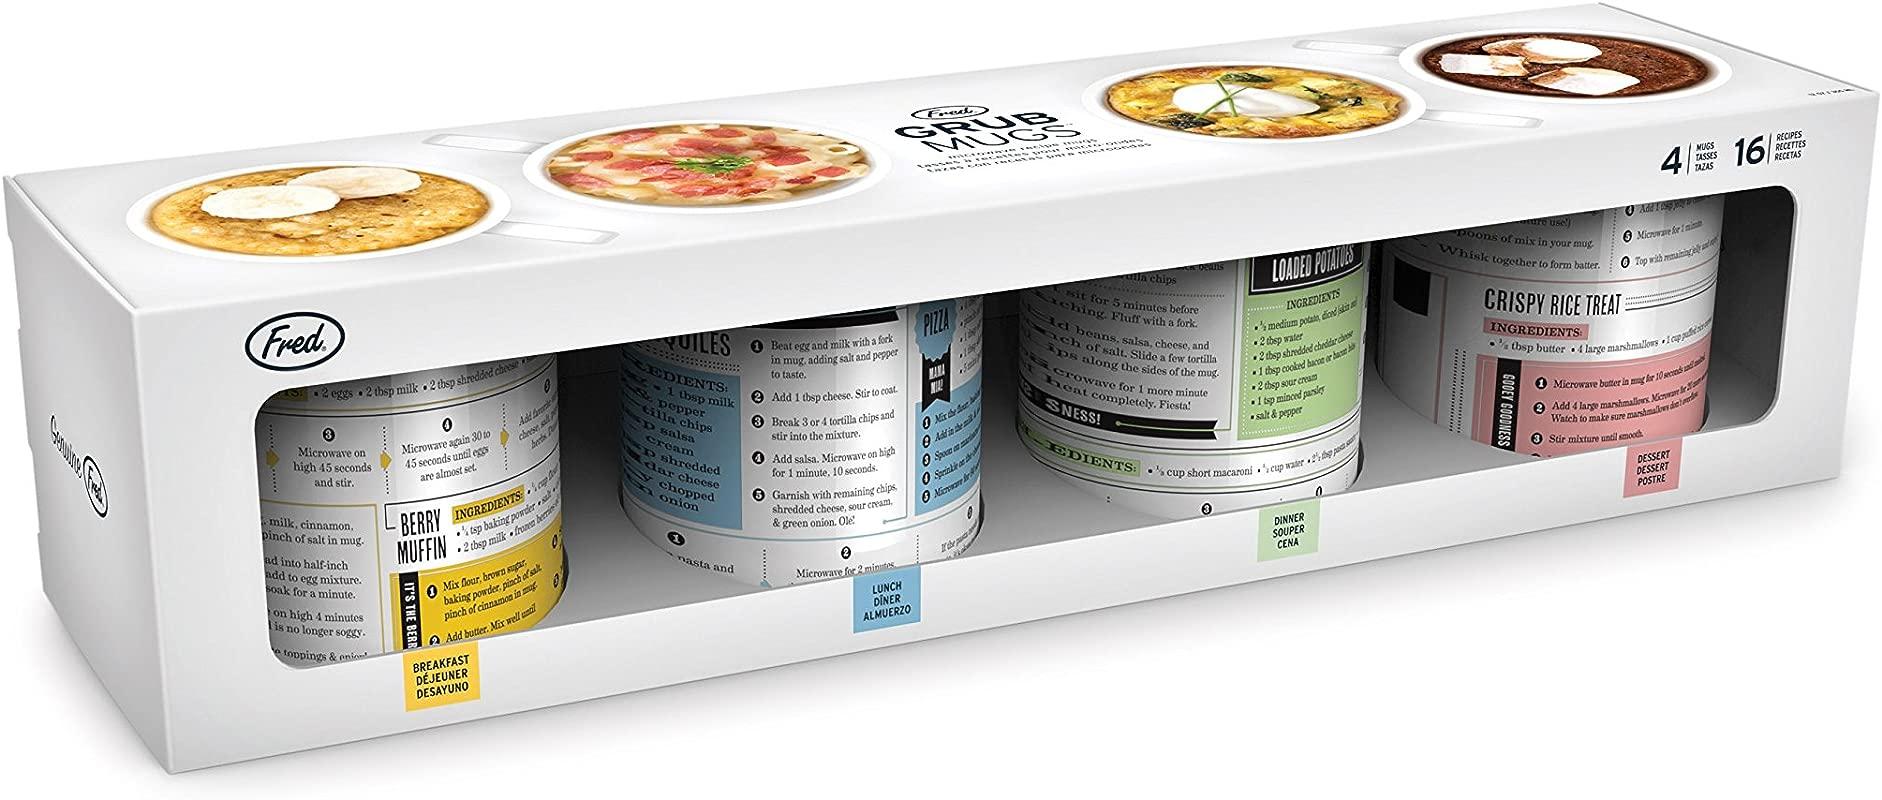 Fred 5200155 GRUB MUGS Microwavable Porcelain Recipe Mugs 12 Total Recipes Gold